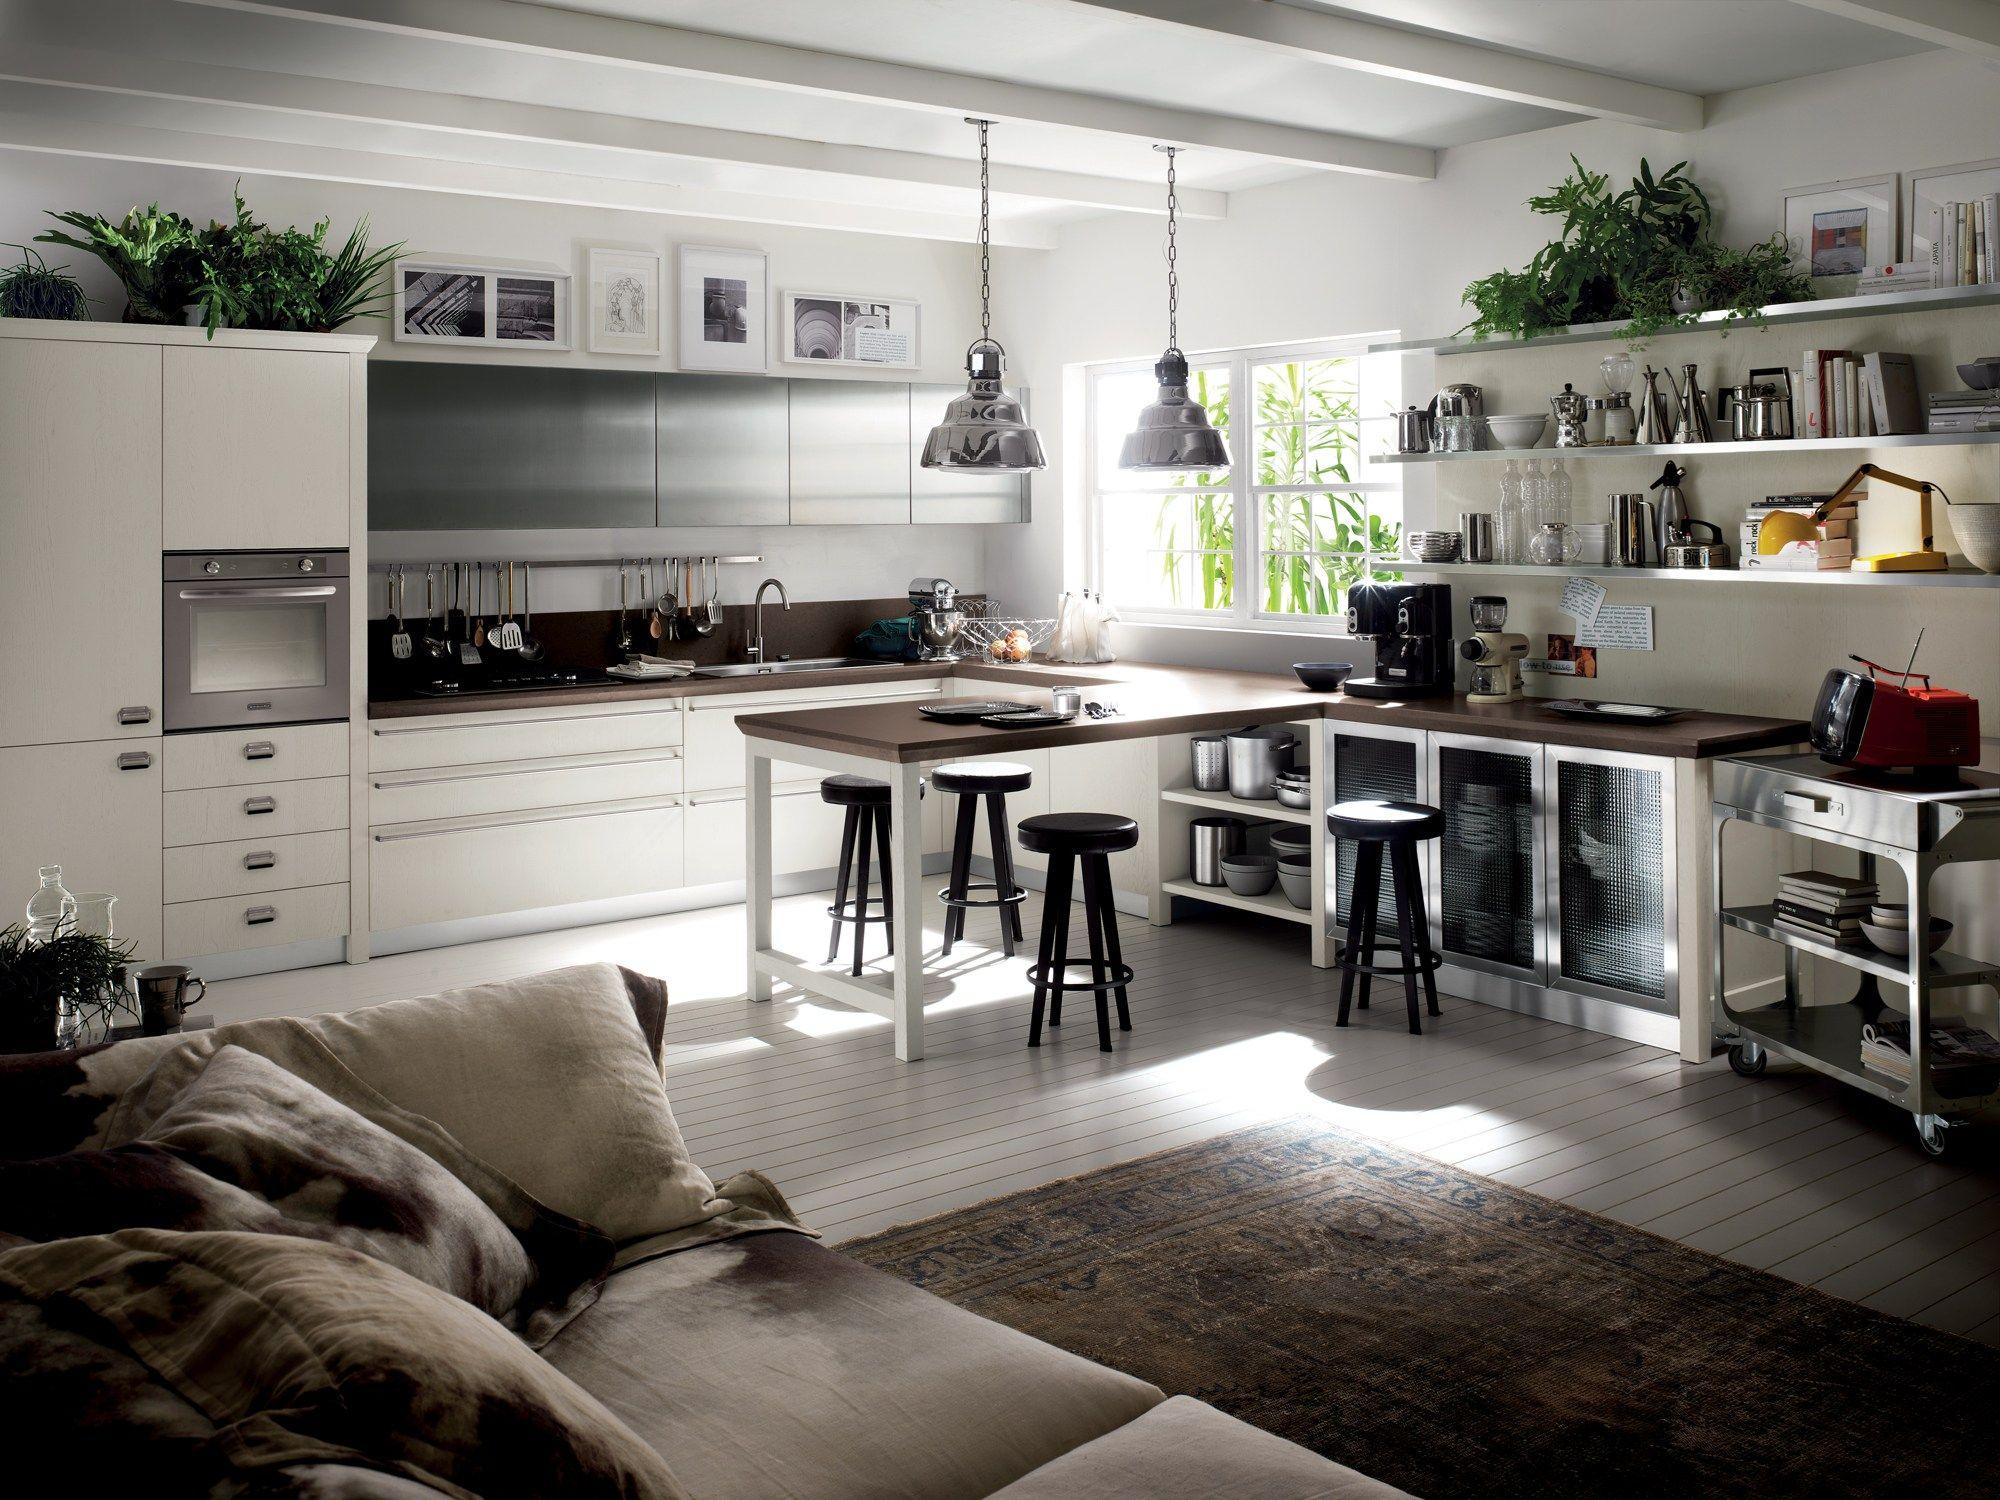 Cucina componibile diesel social kitchen linea scavolini by scavolini design diesel living with for Cucina diesel scavolini